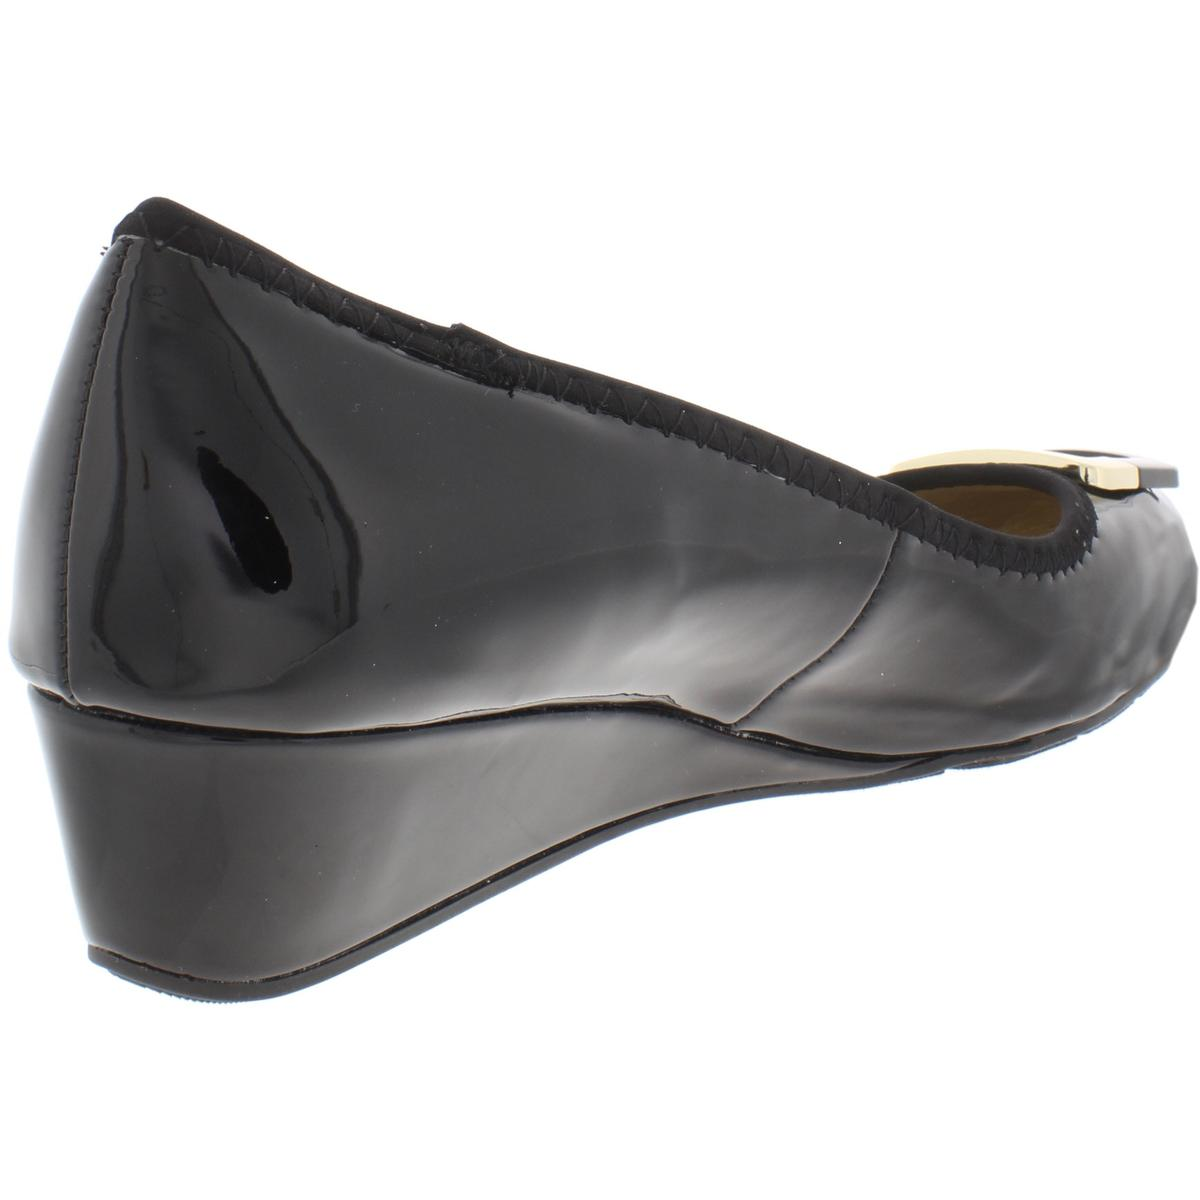 Bandolino-Womens-Tad-Padded-Insole-Round-Toe-Dressy-Wedge-Heels-Shoes-BHFO-3570 thumbnail 4